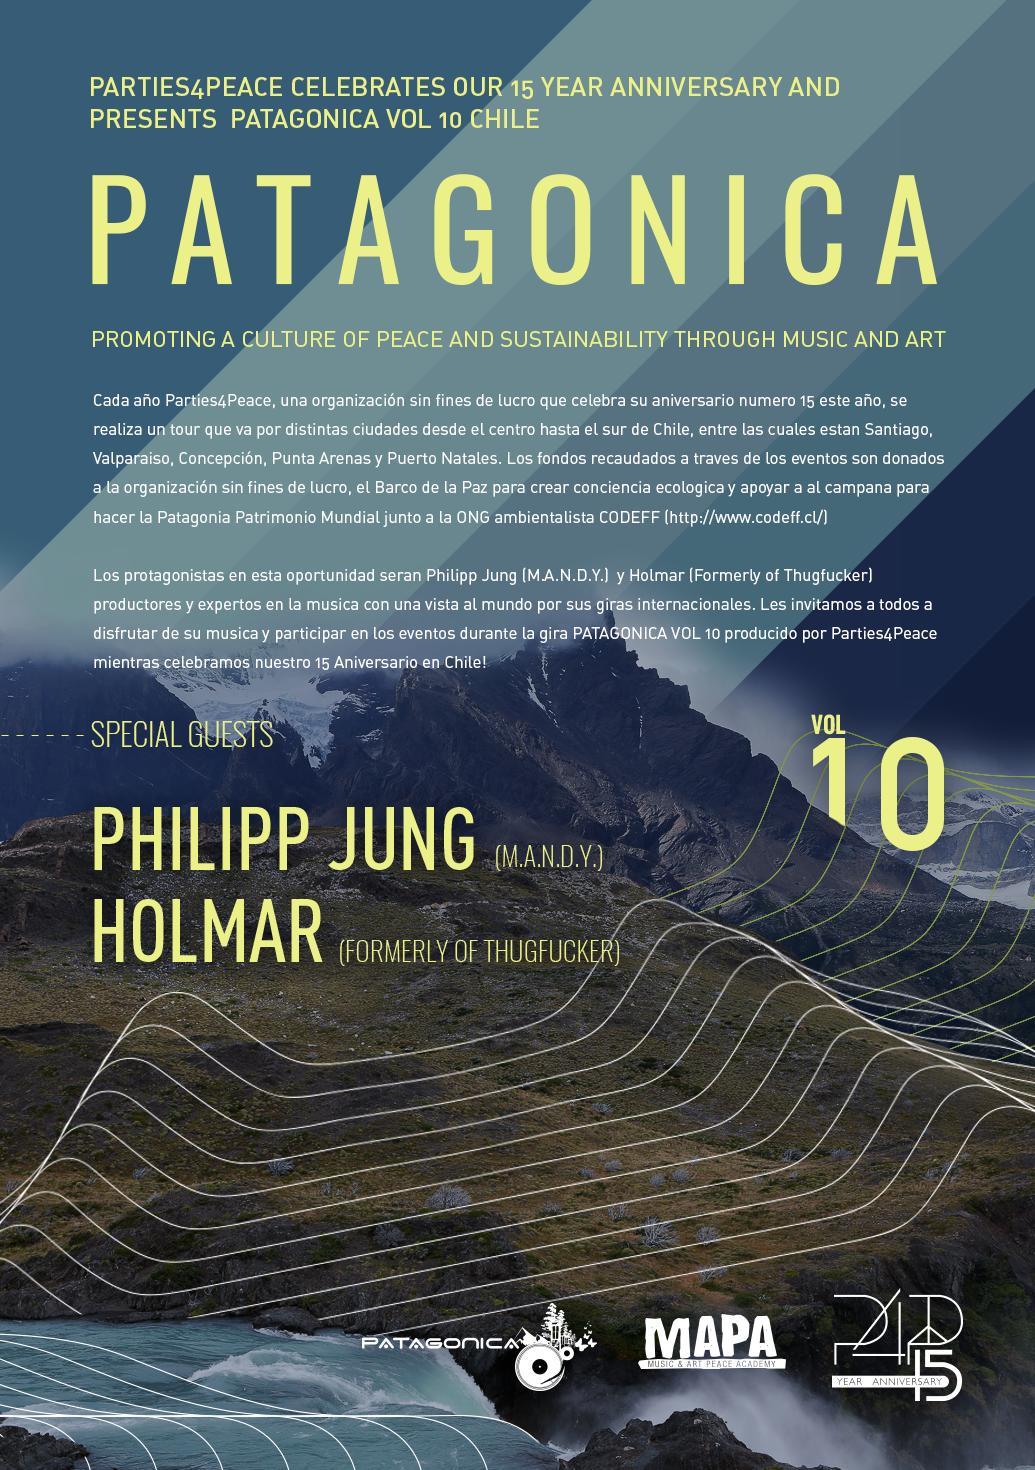 Vuelve Patagonica, la gira musical organizada por Parties4Peace